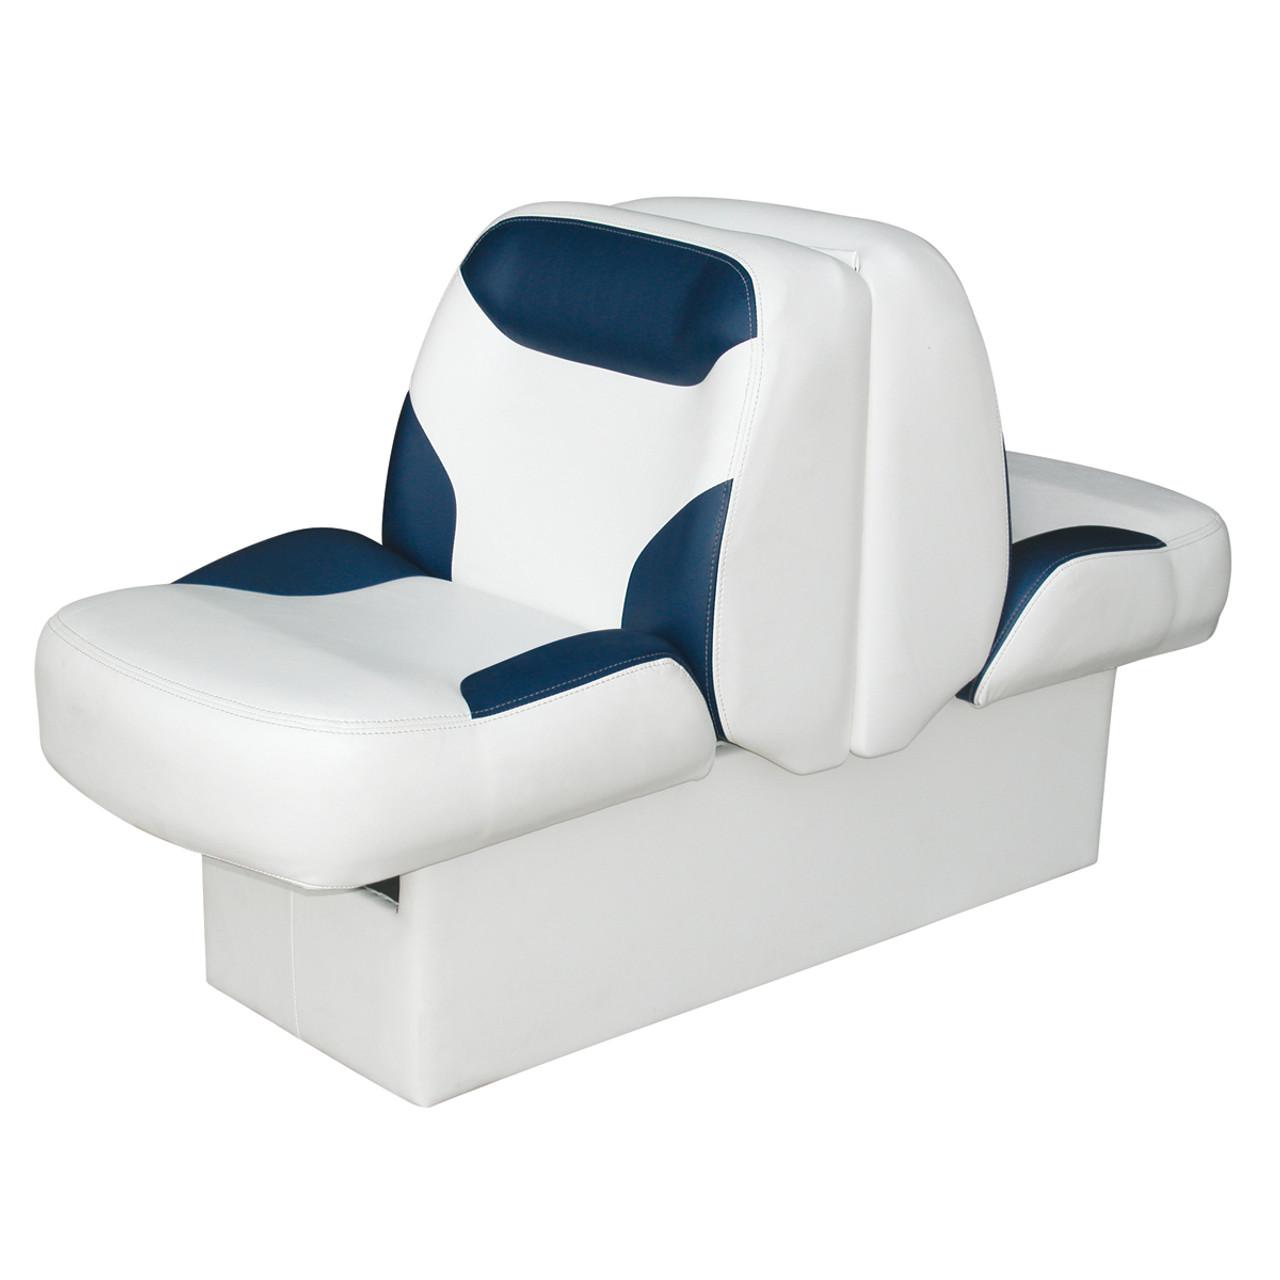 Wondrous Back To Back Boat Seats All You Need Infos Creativecarmelina Interior Chair Design Creativecarmelinacom